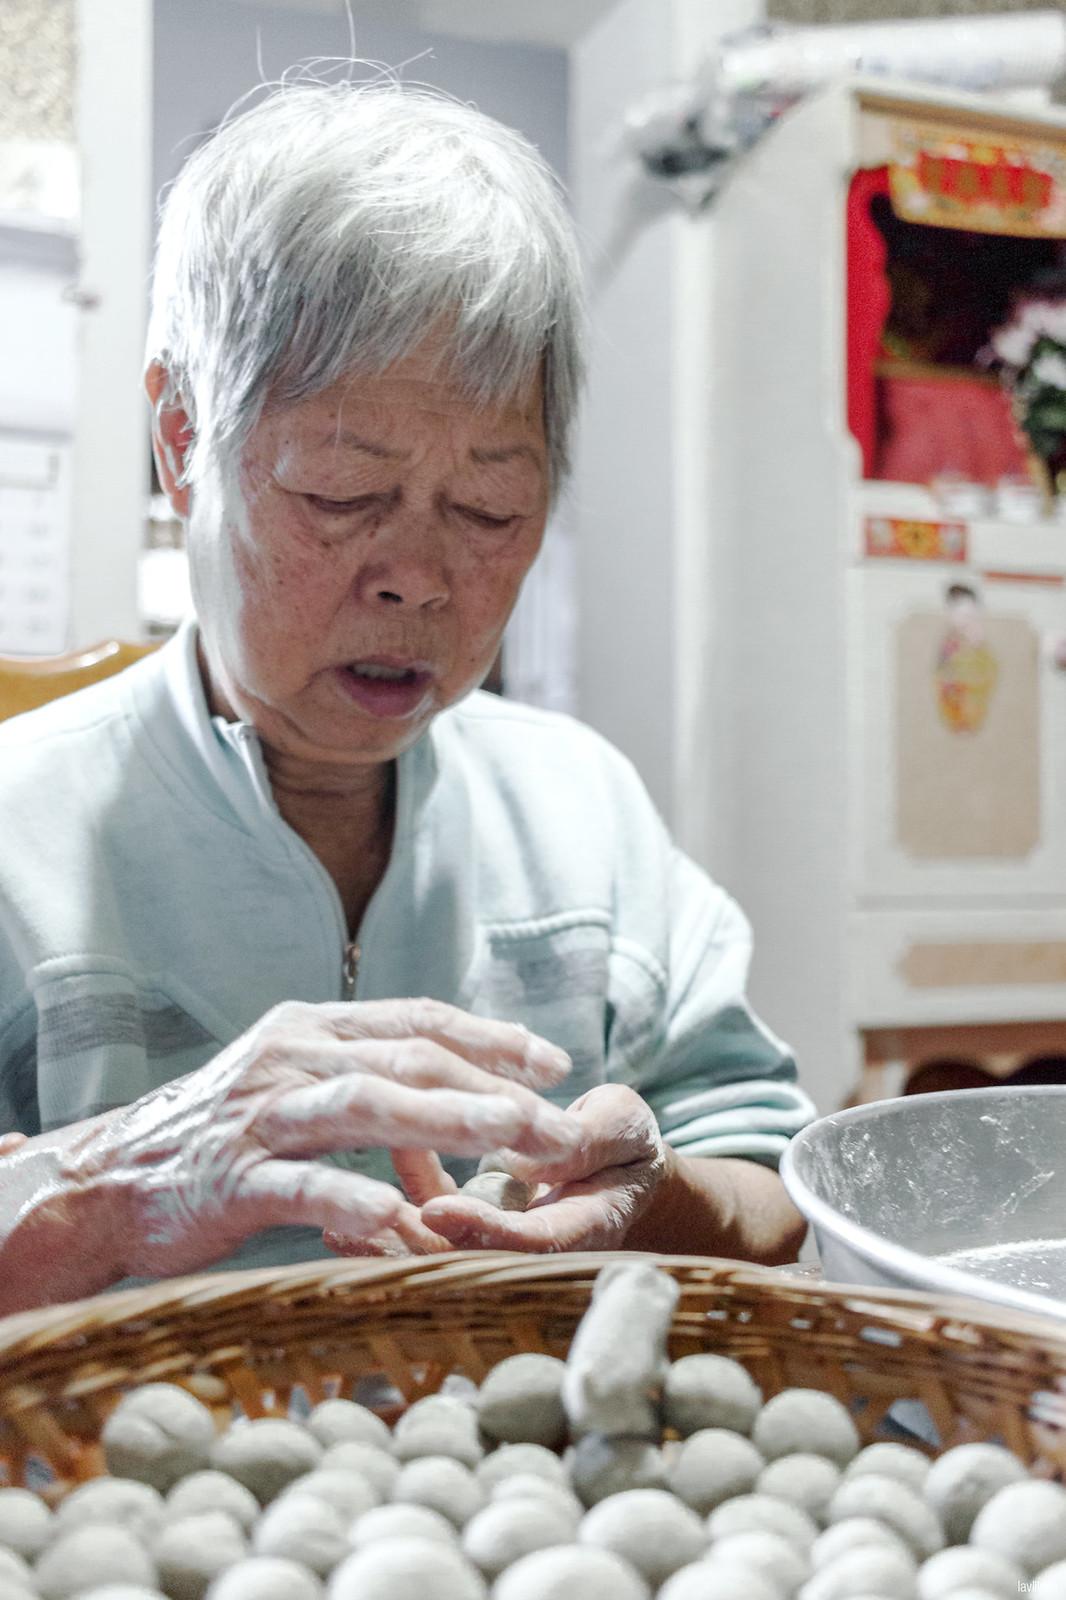 lavlilacs | Taishan Eats 台山美食 | Skunk Vine Rice Cake Balls - Foo Keen Haang Yuan - 烏芹藤圓 | Grandma's homestyle foods